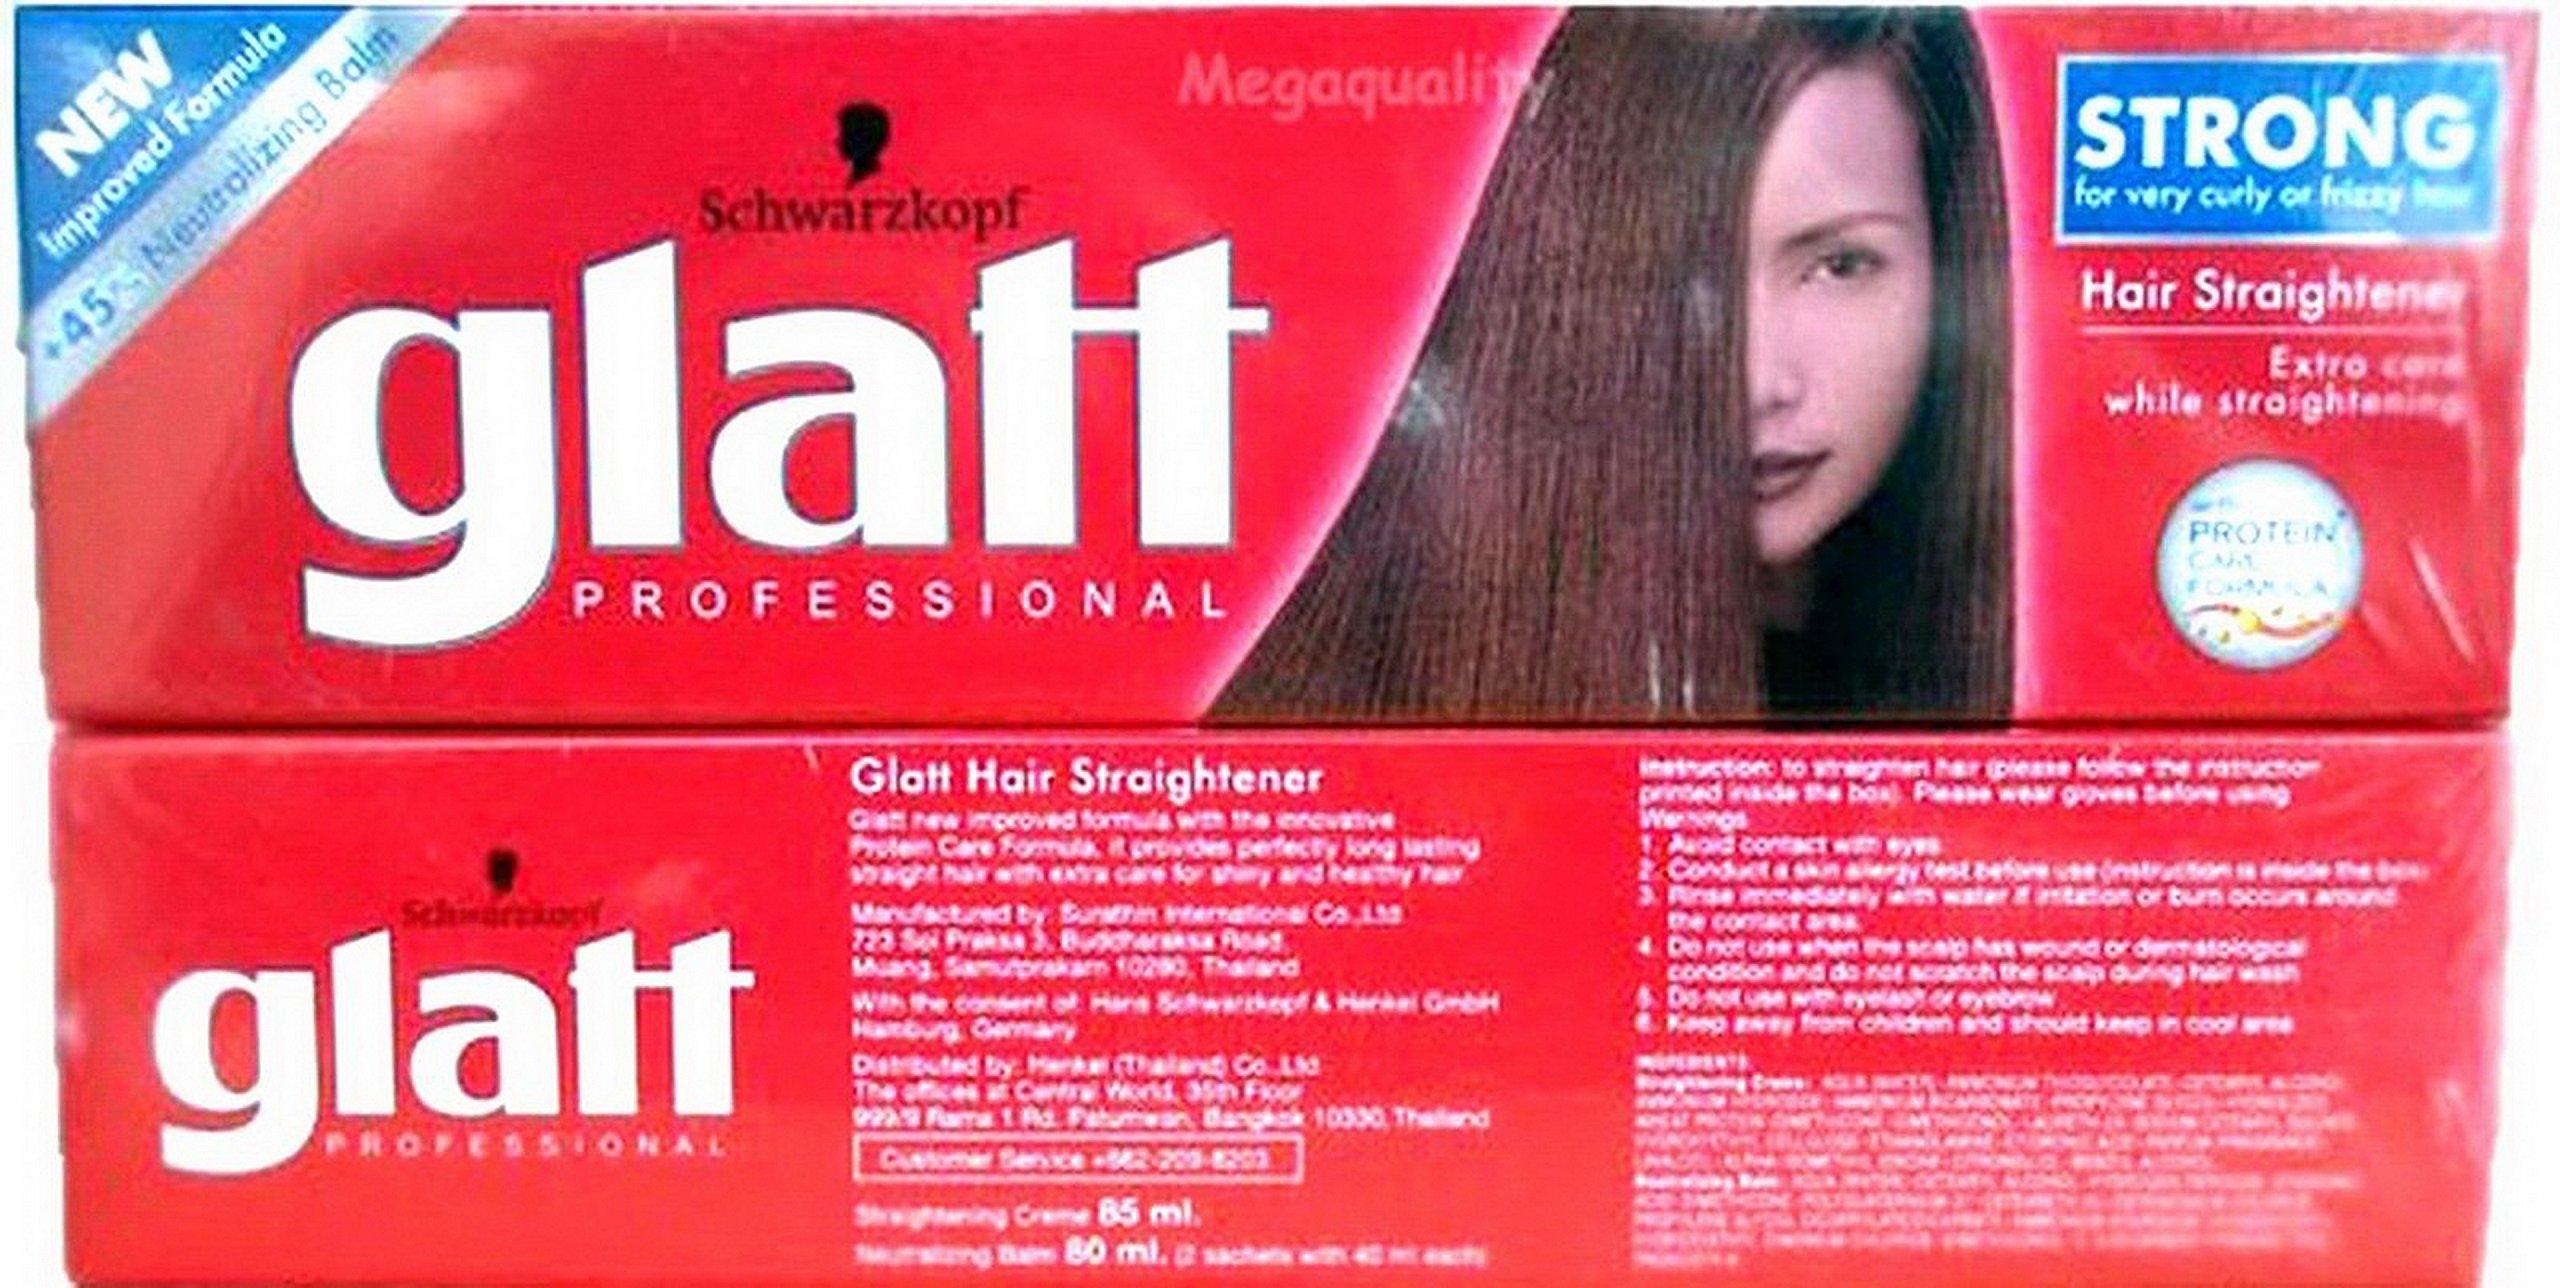 Schwarzkopf Glatt Professional Hair Straightener Strong 85ml